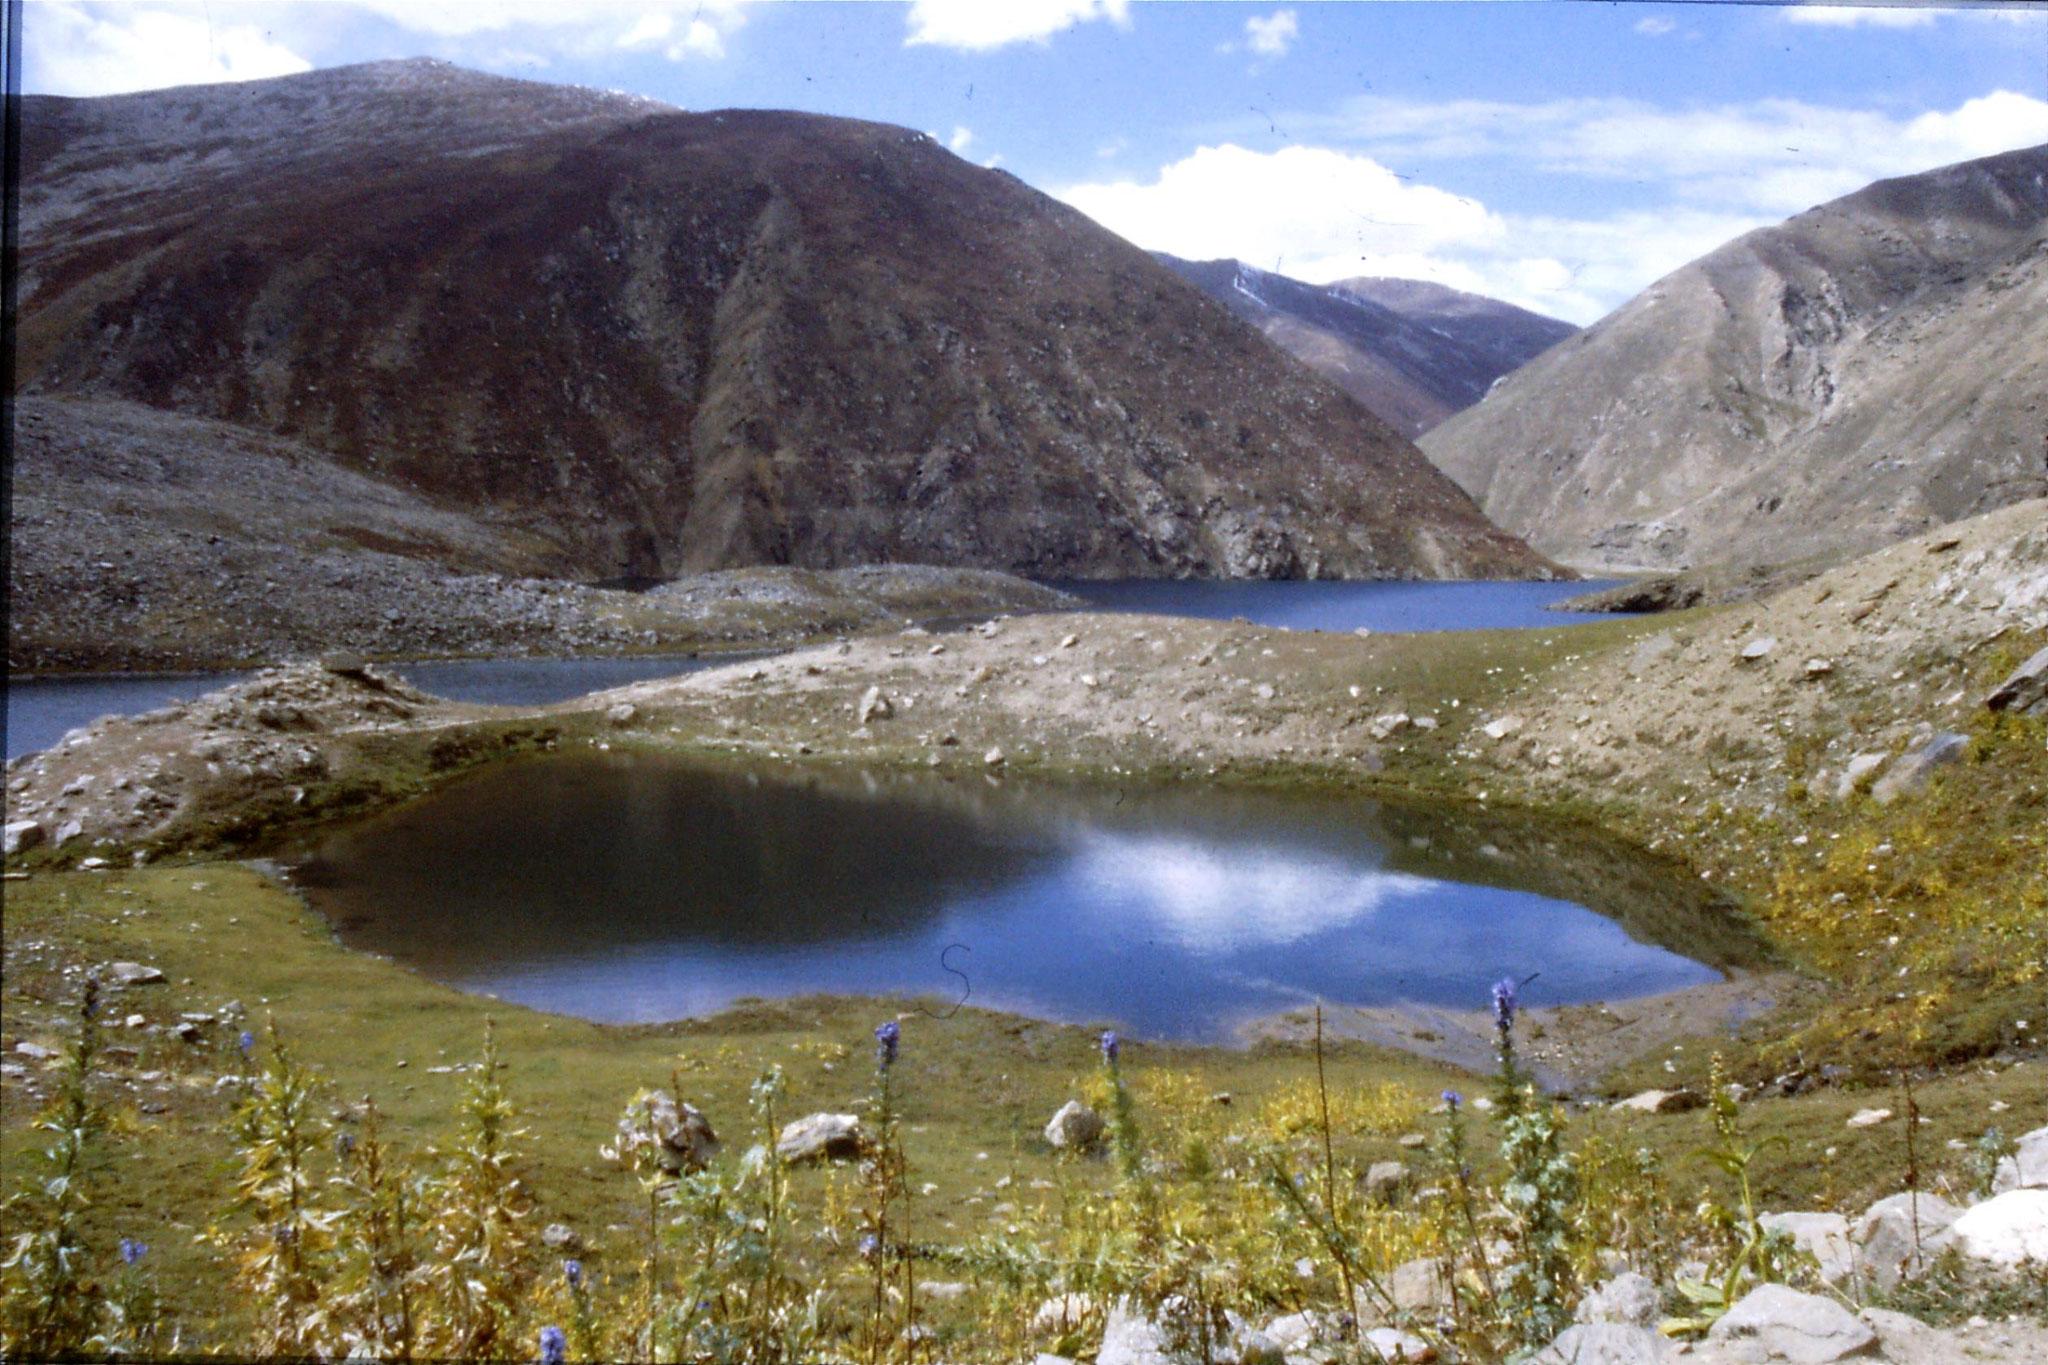 6/10/1989: 30: Lake Lulusar